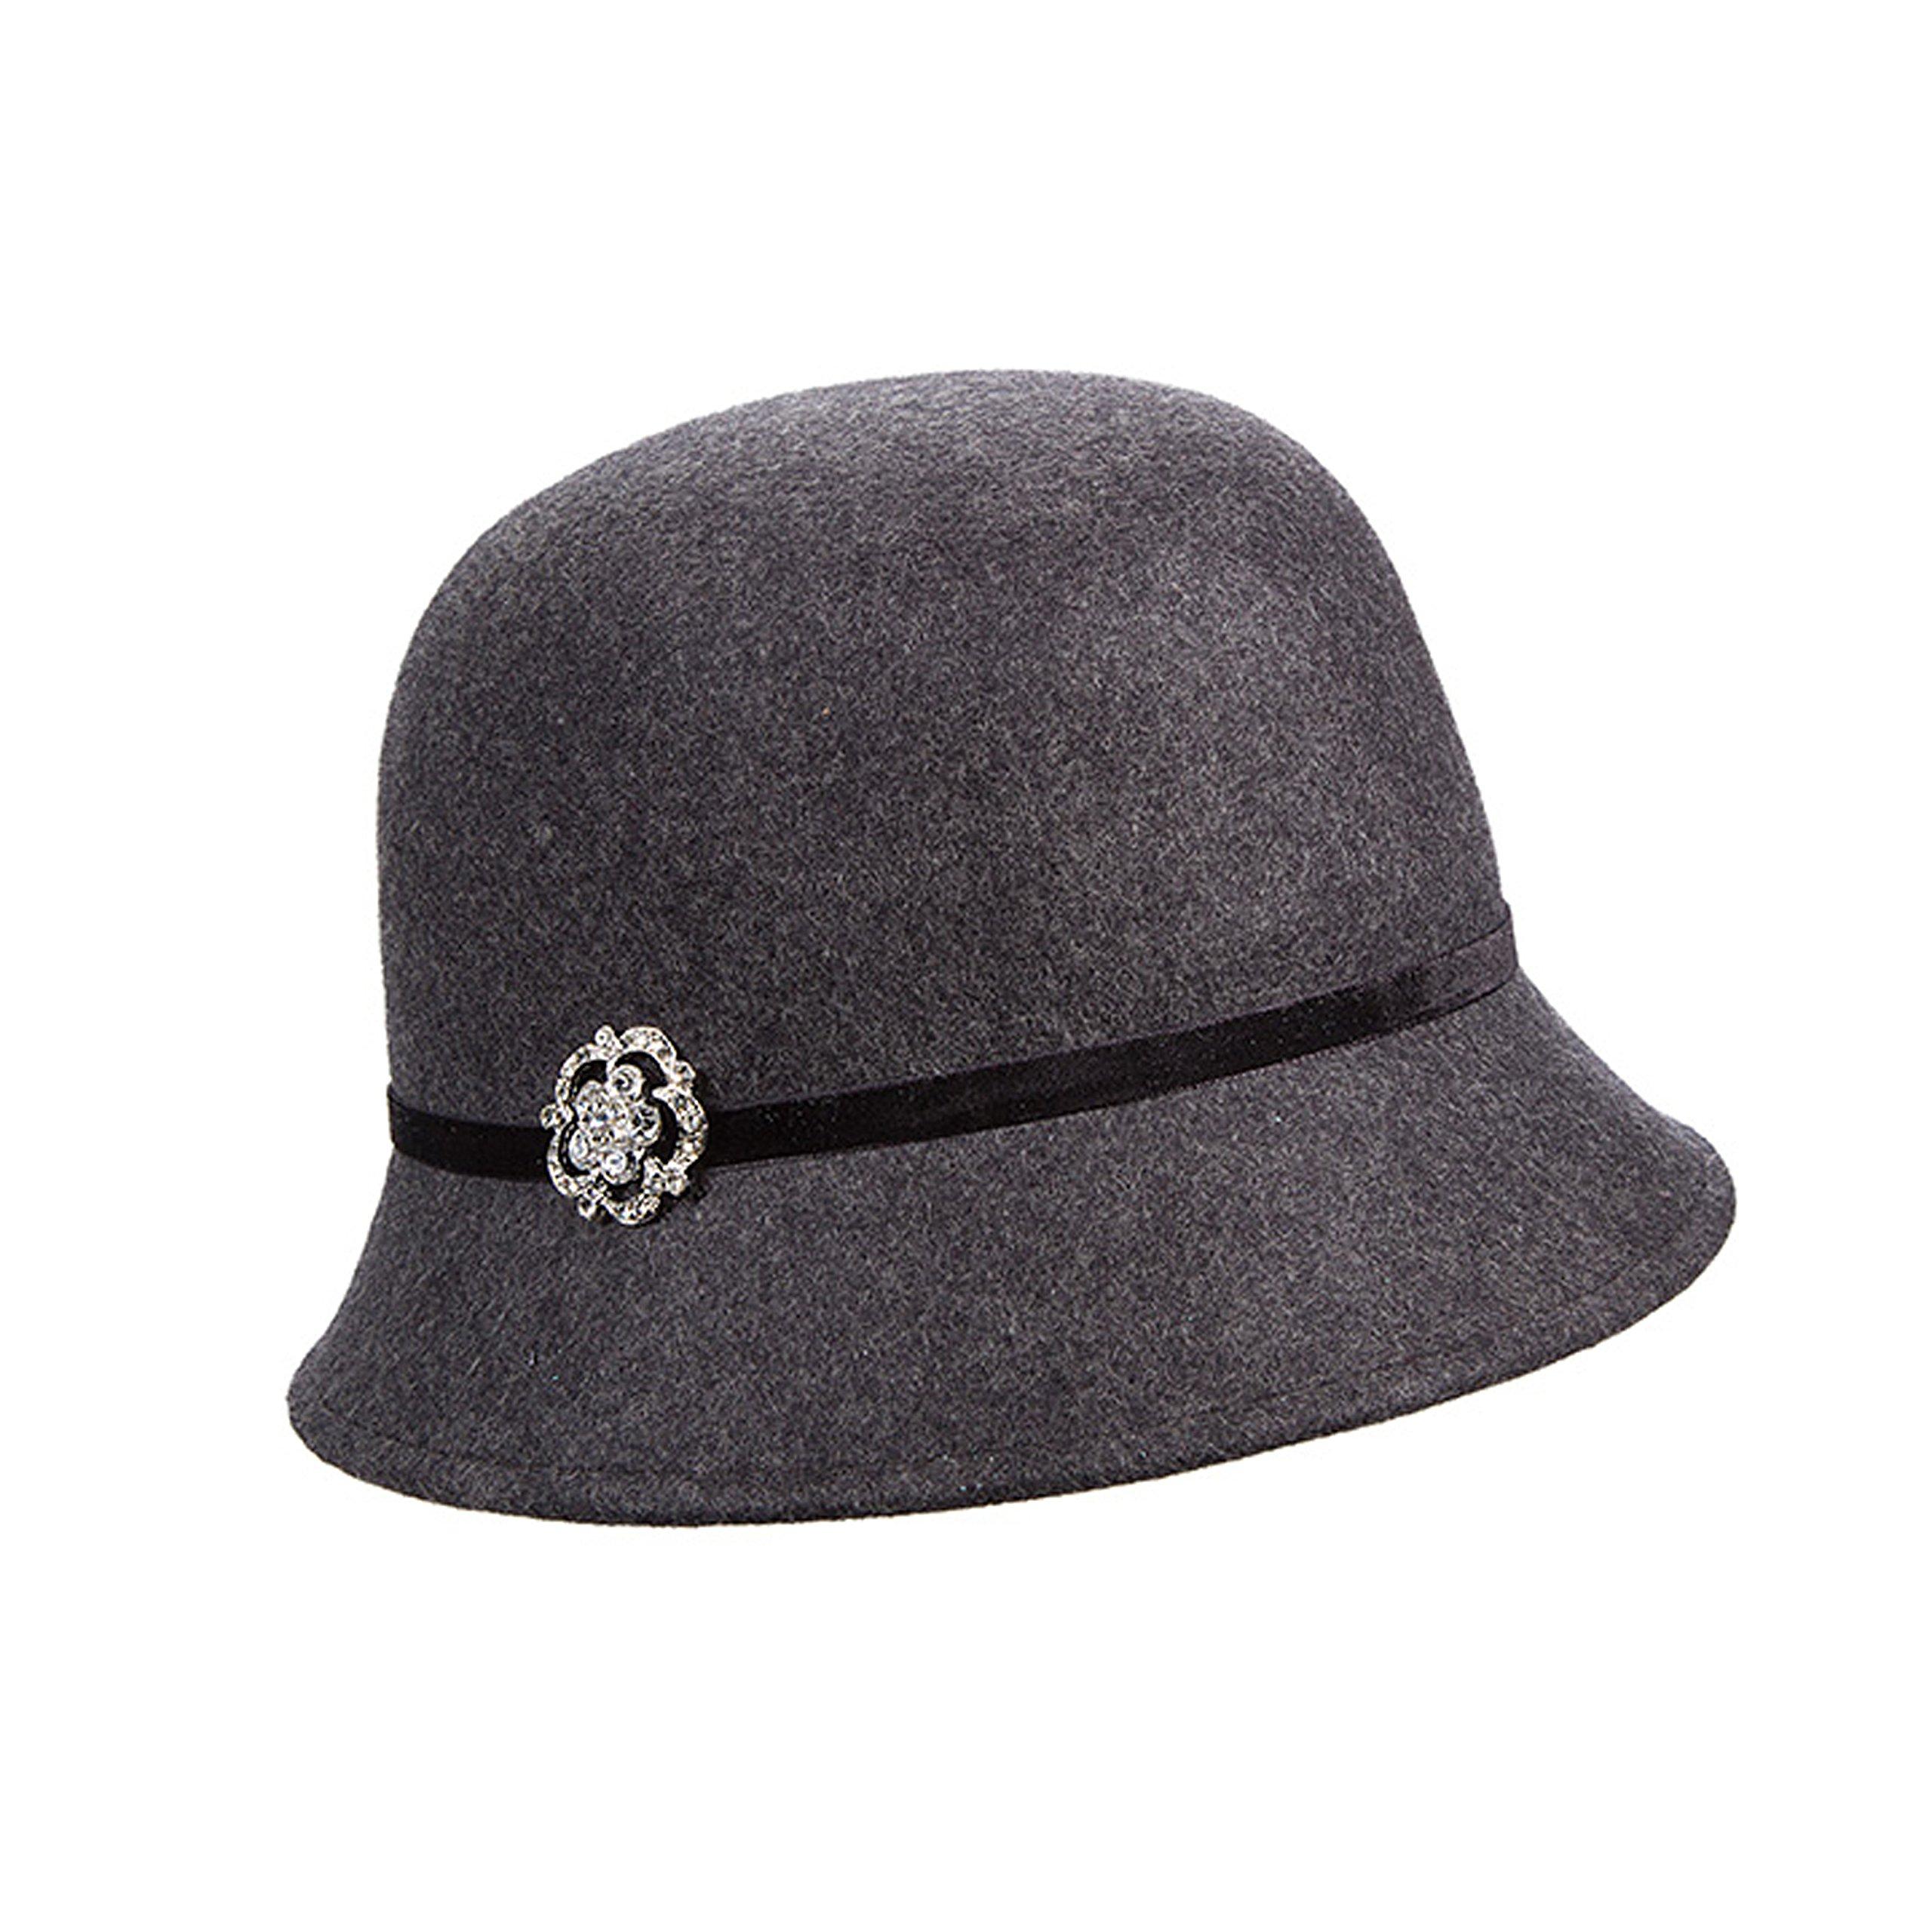 Callanan Wool Felt Cloche with Broach Winter Hat (Charcoal)